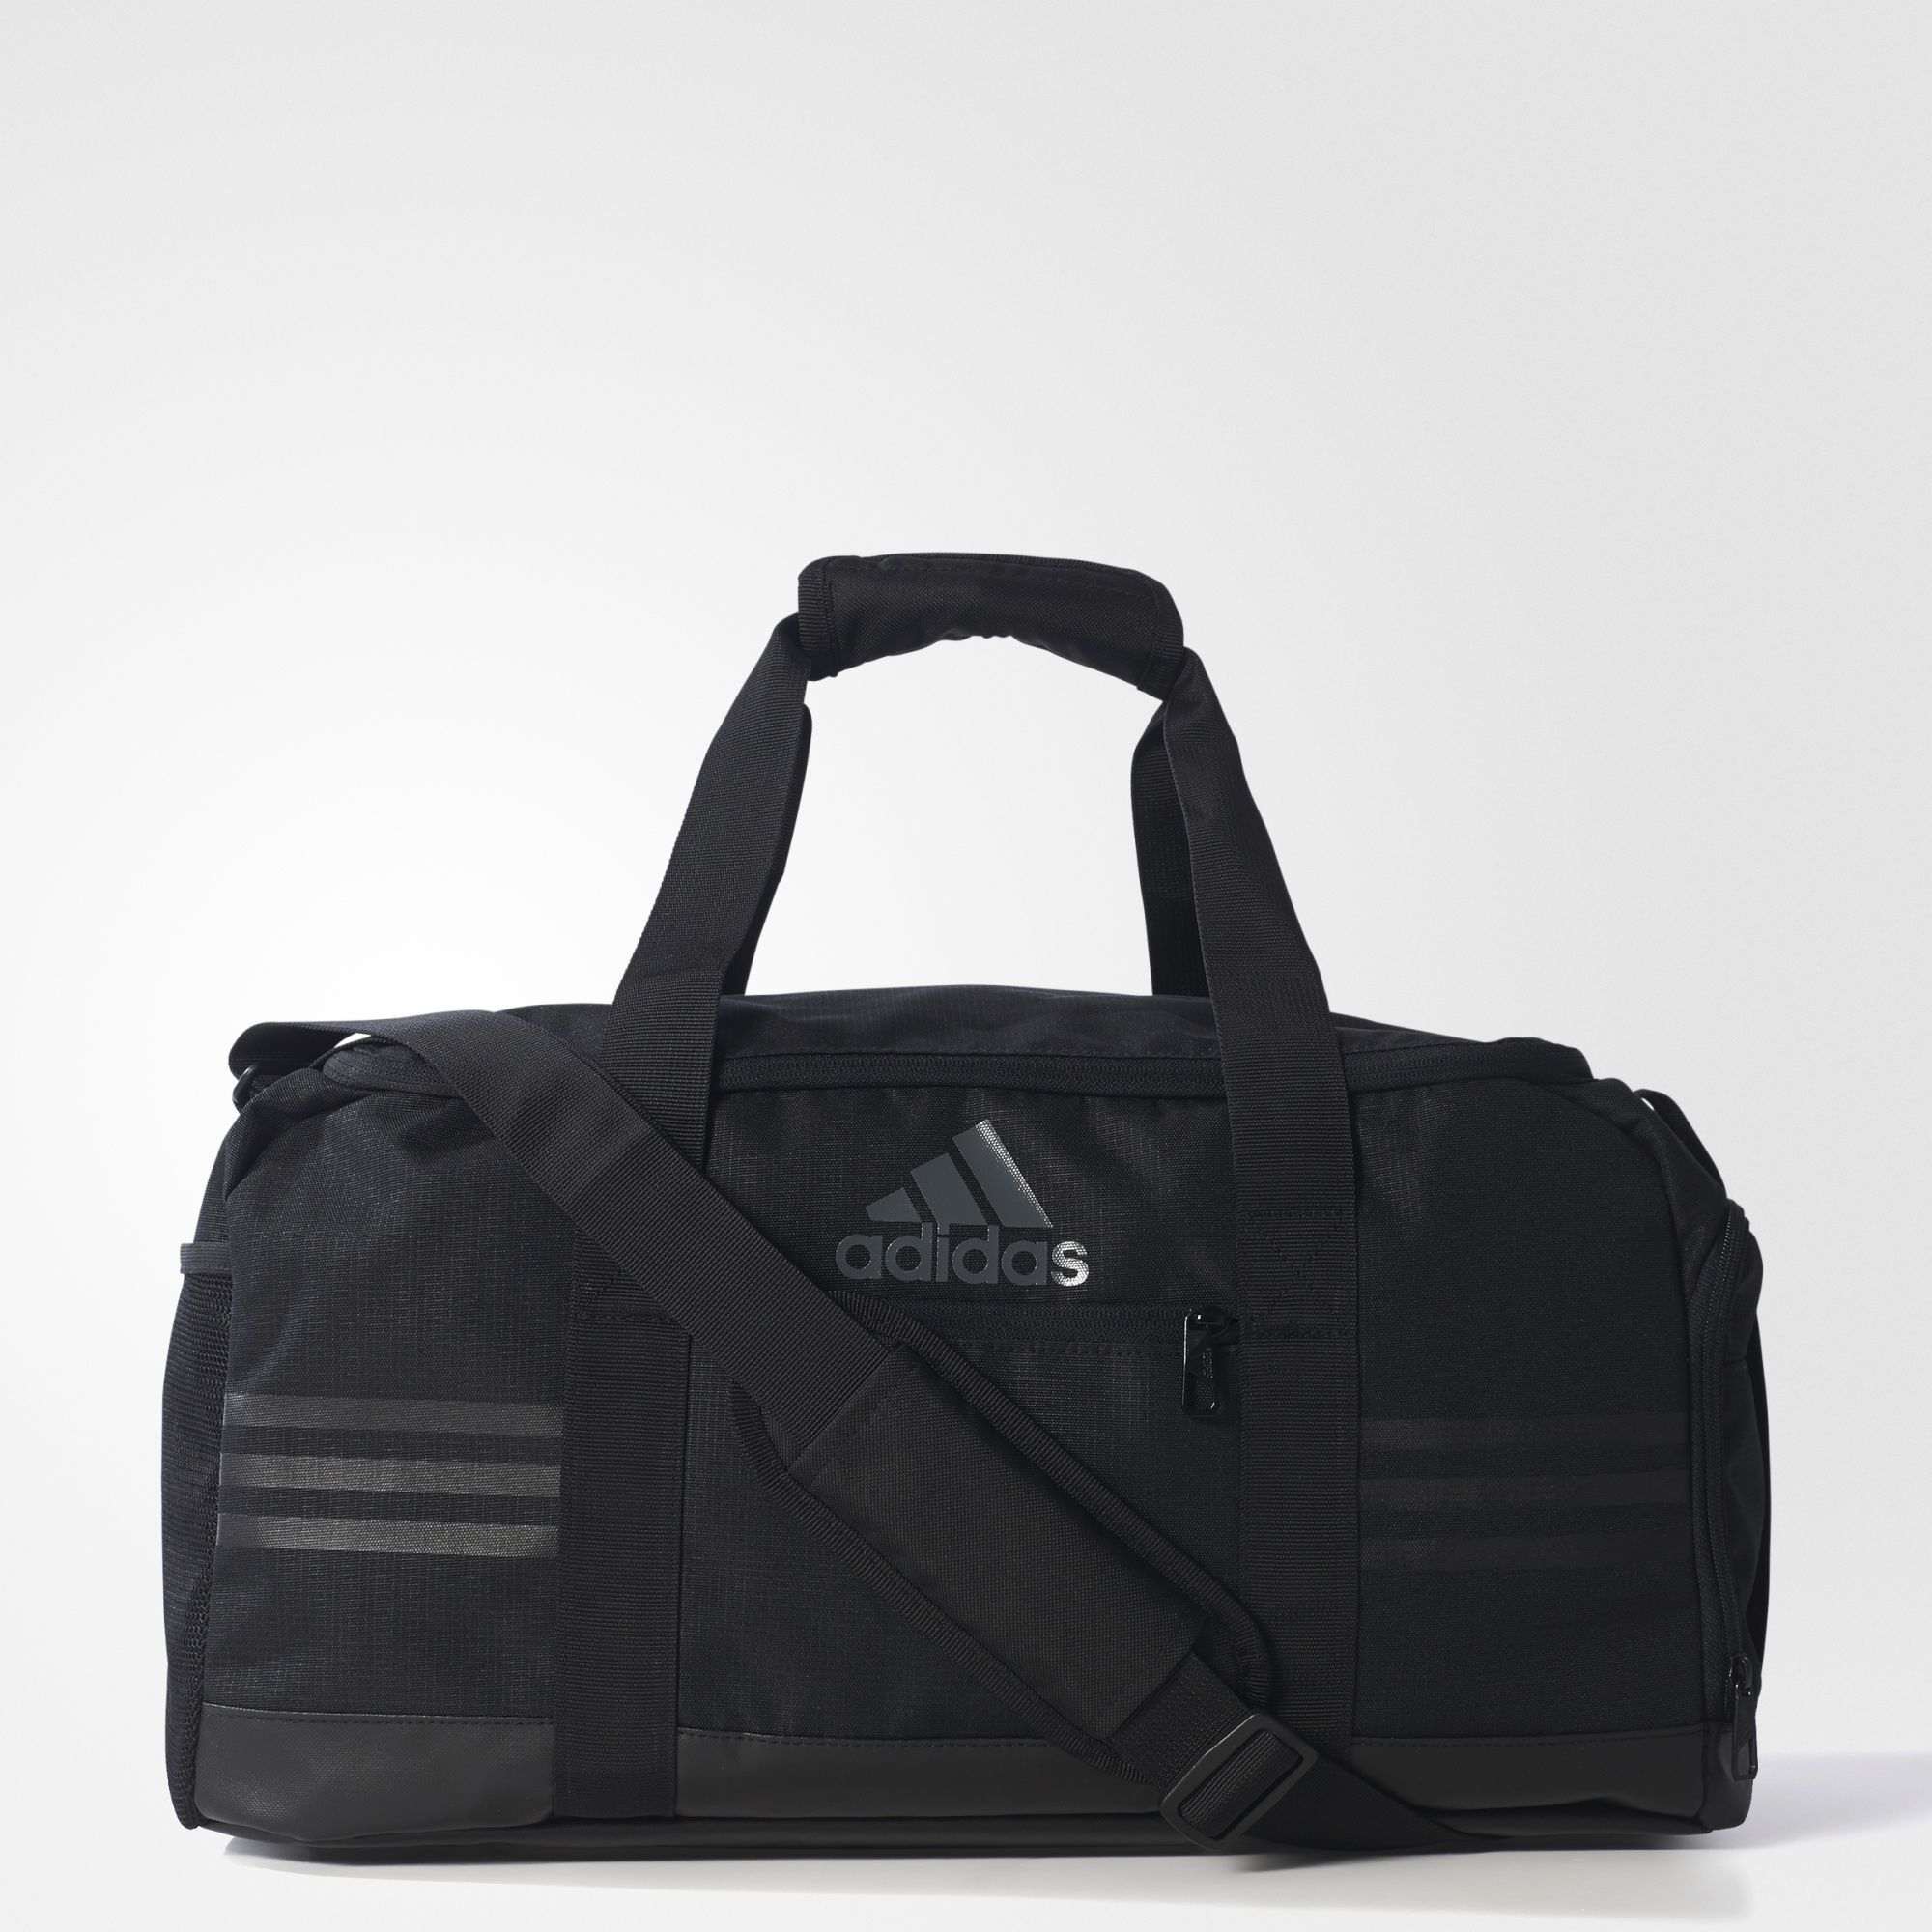 adidas - 3-Stripes Performance Team Bag Small